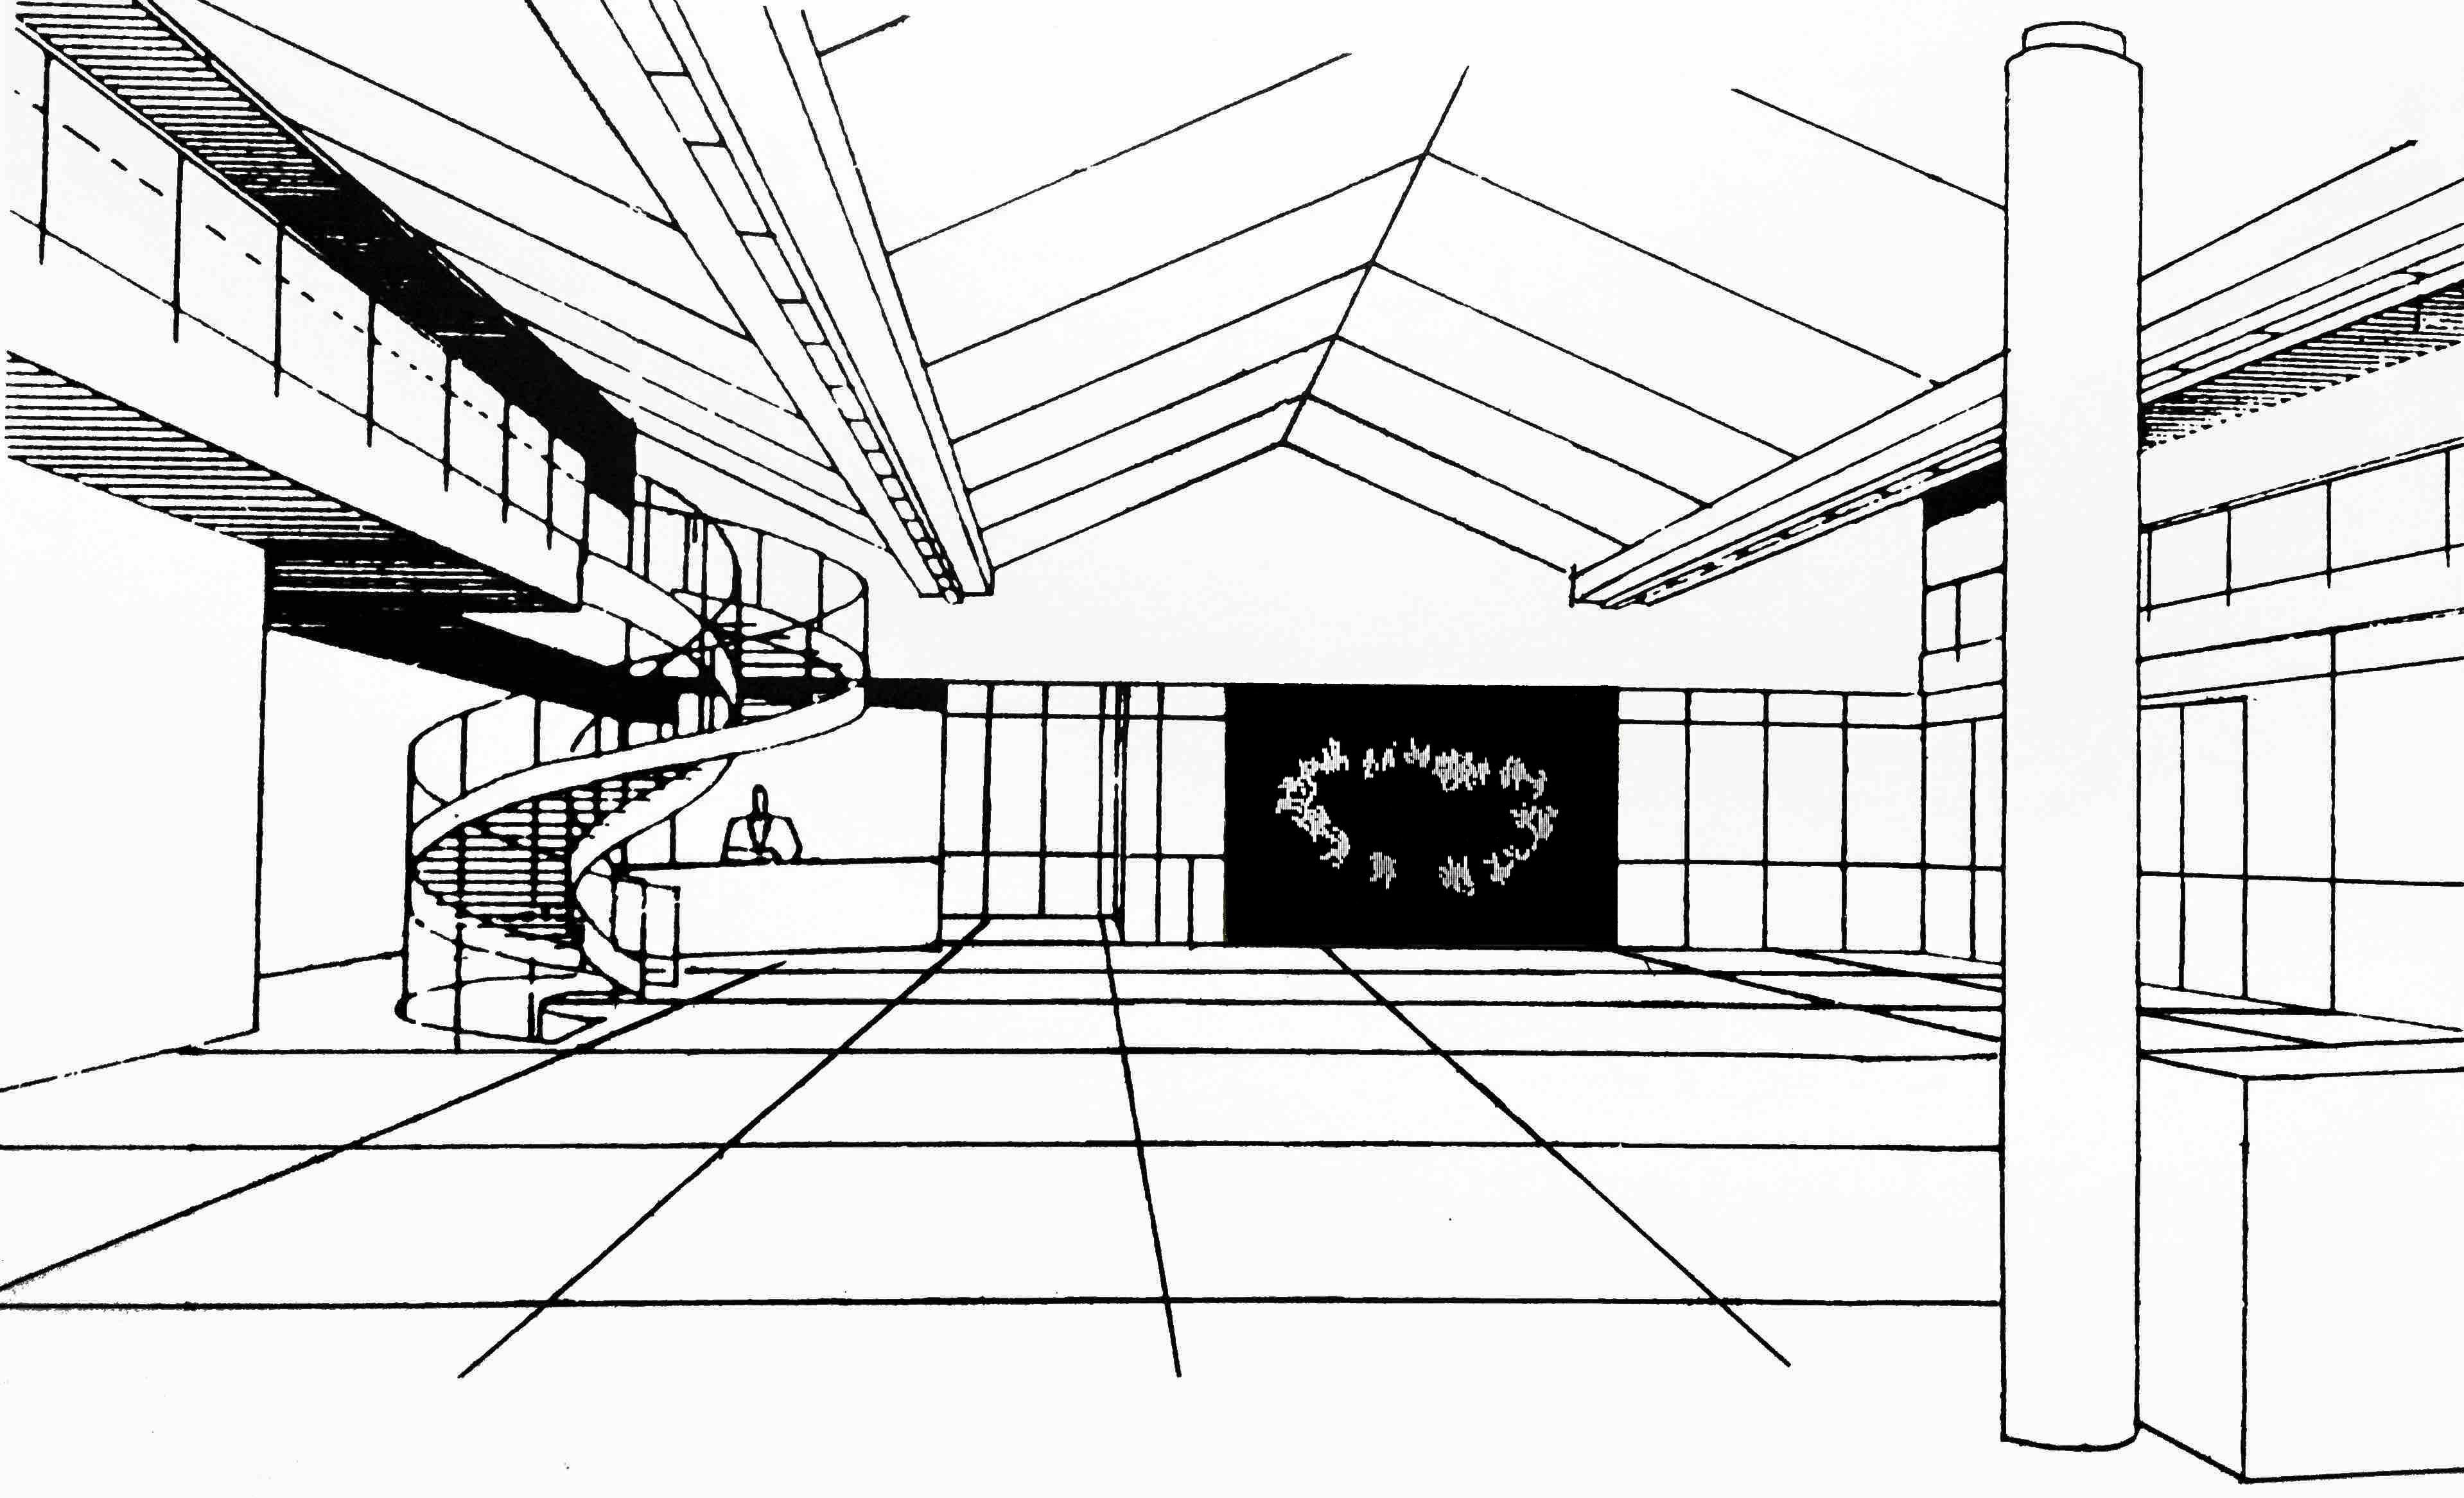 simulation foyerhalle, 1991